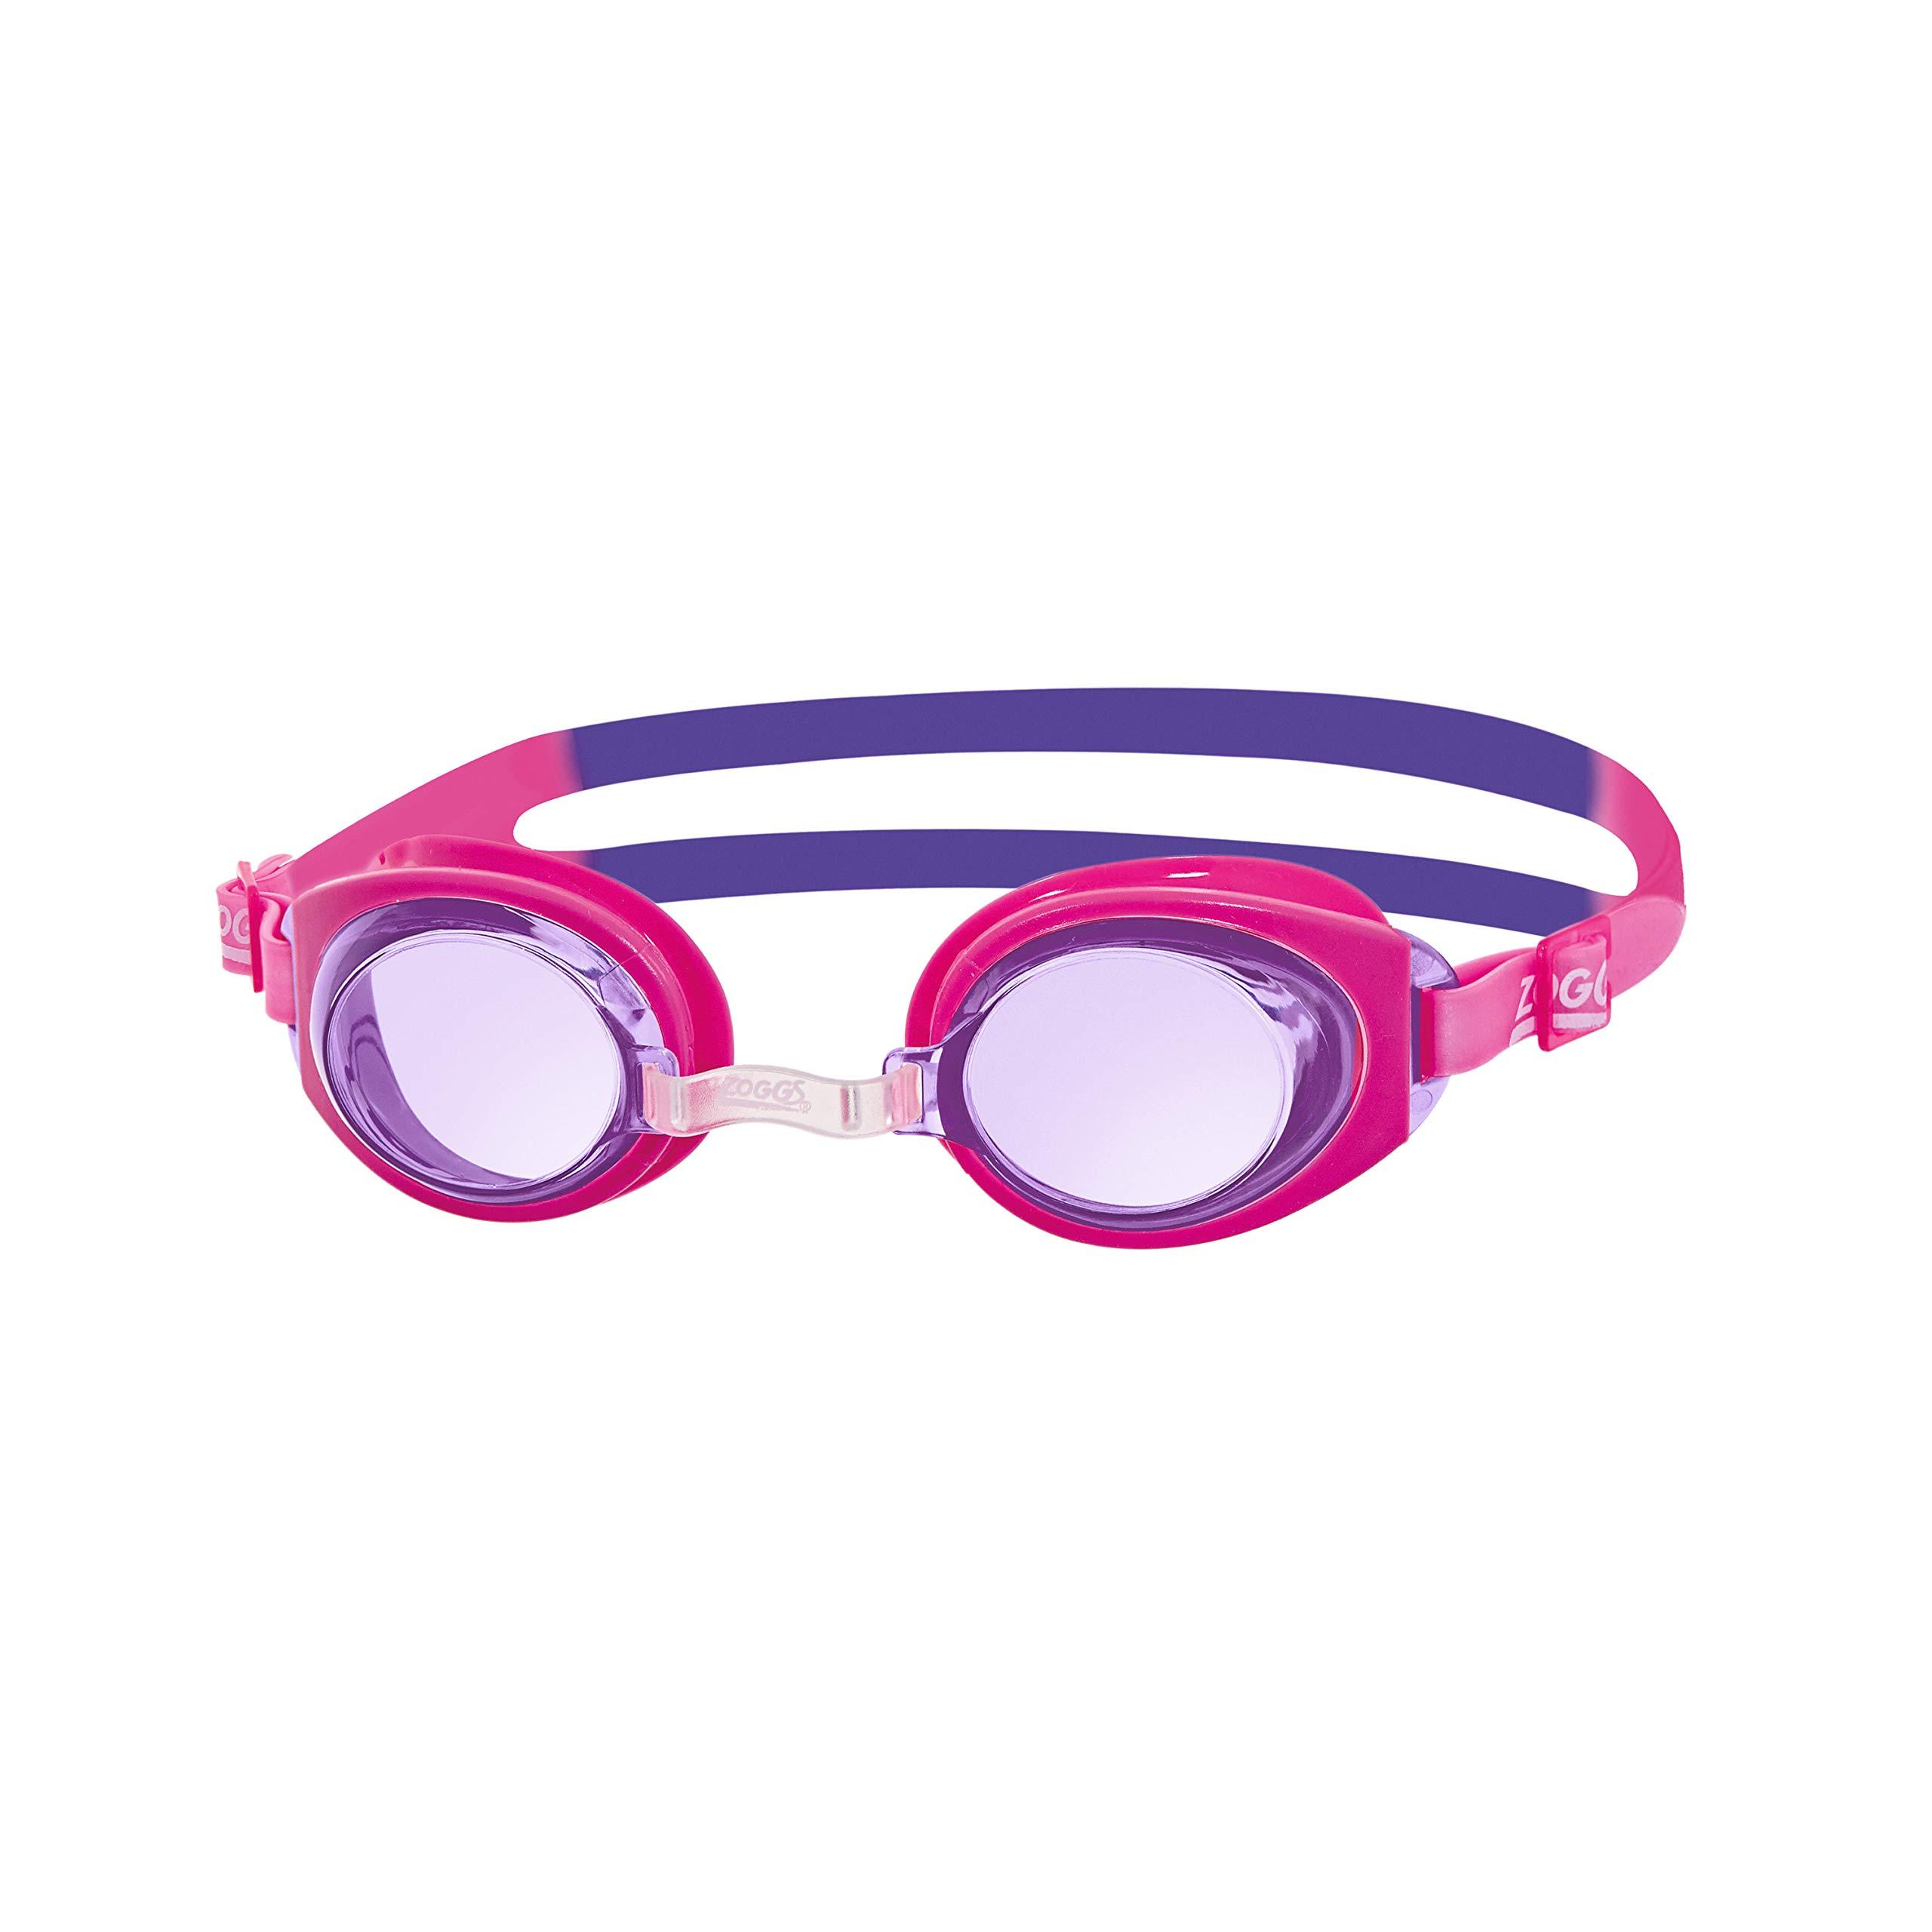 Zoggs Ripper Kids Childrens Swimming Goggles 6-14 Years Anti Fog Adjust Pink